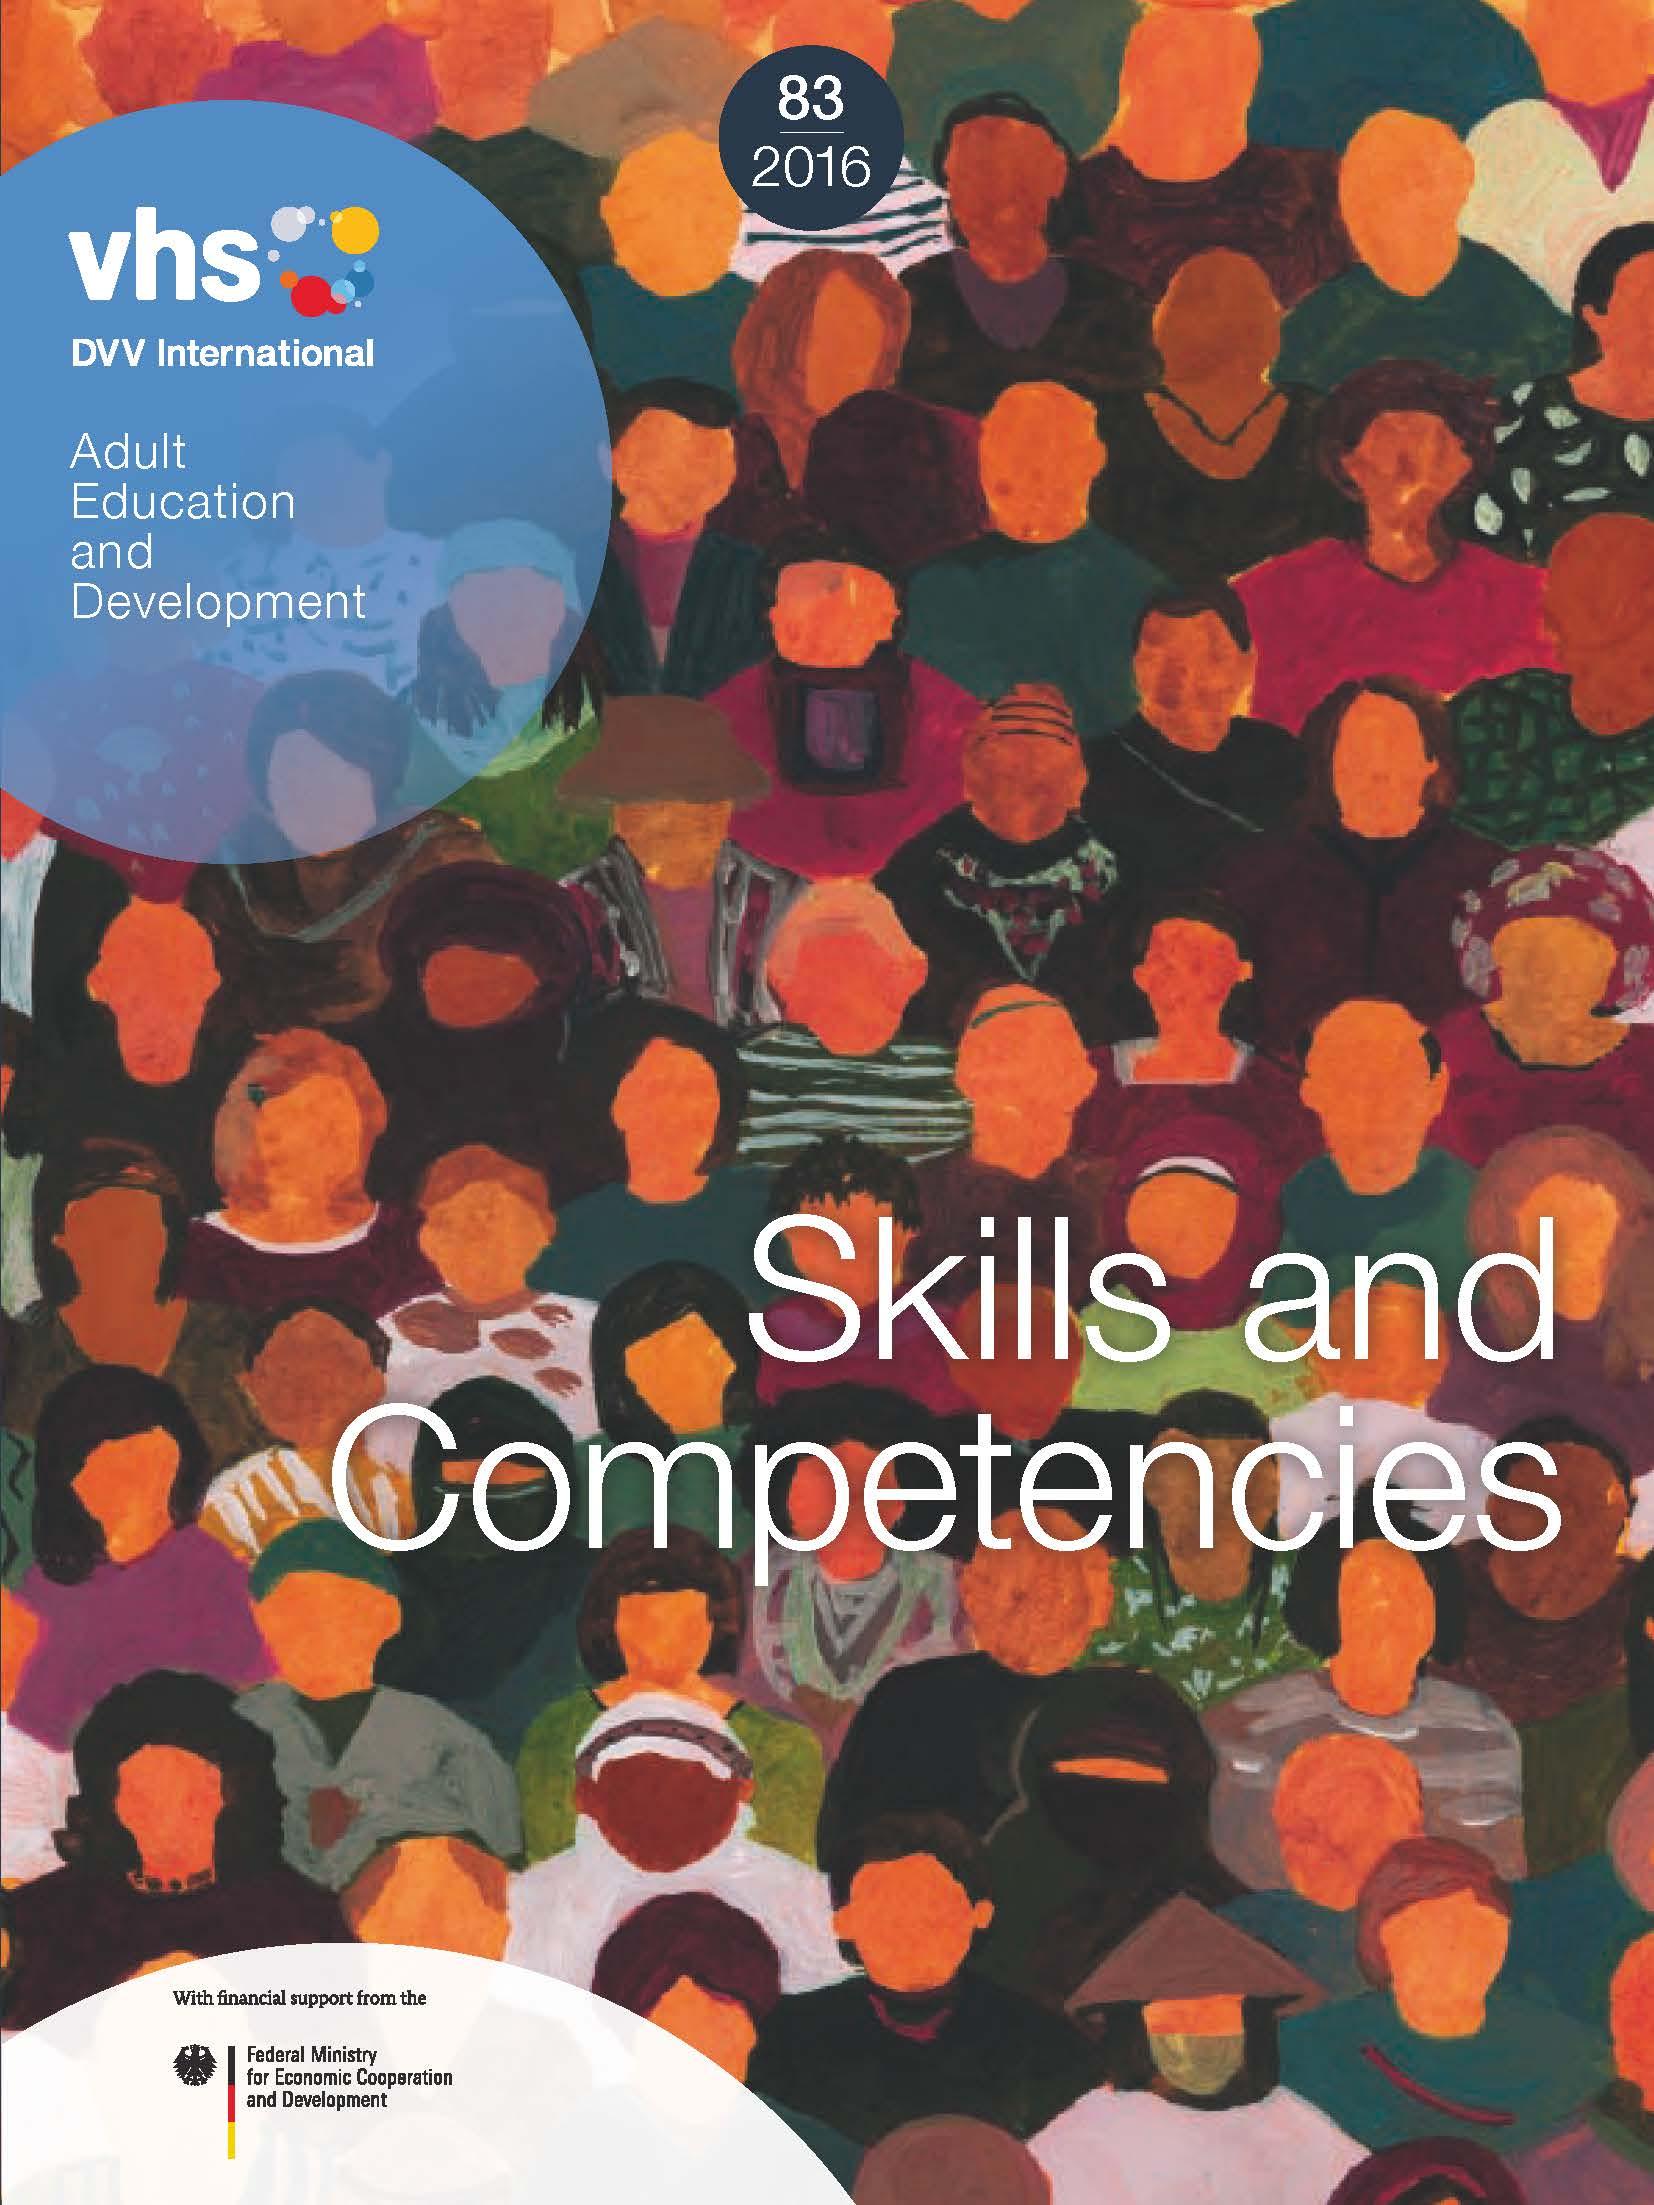 Virtual Seminar On Skills And Competencies Starts In April